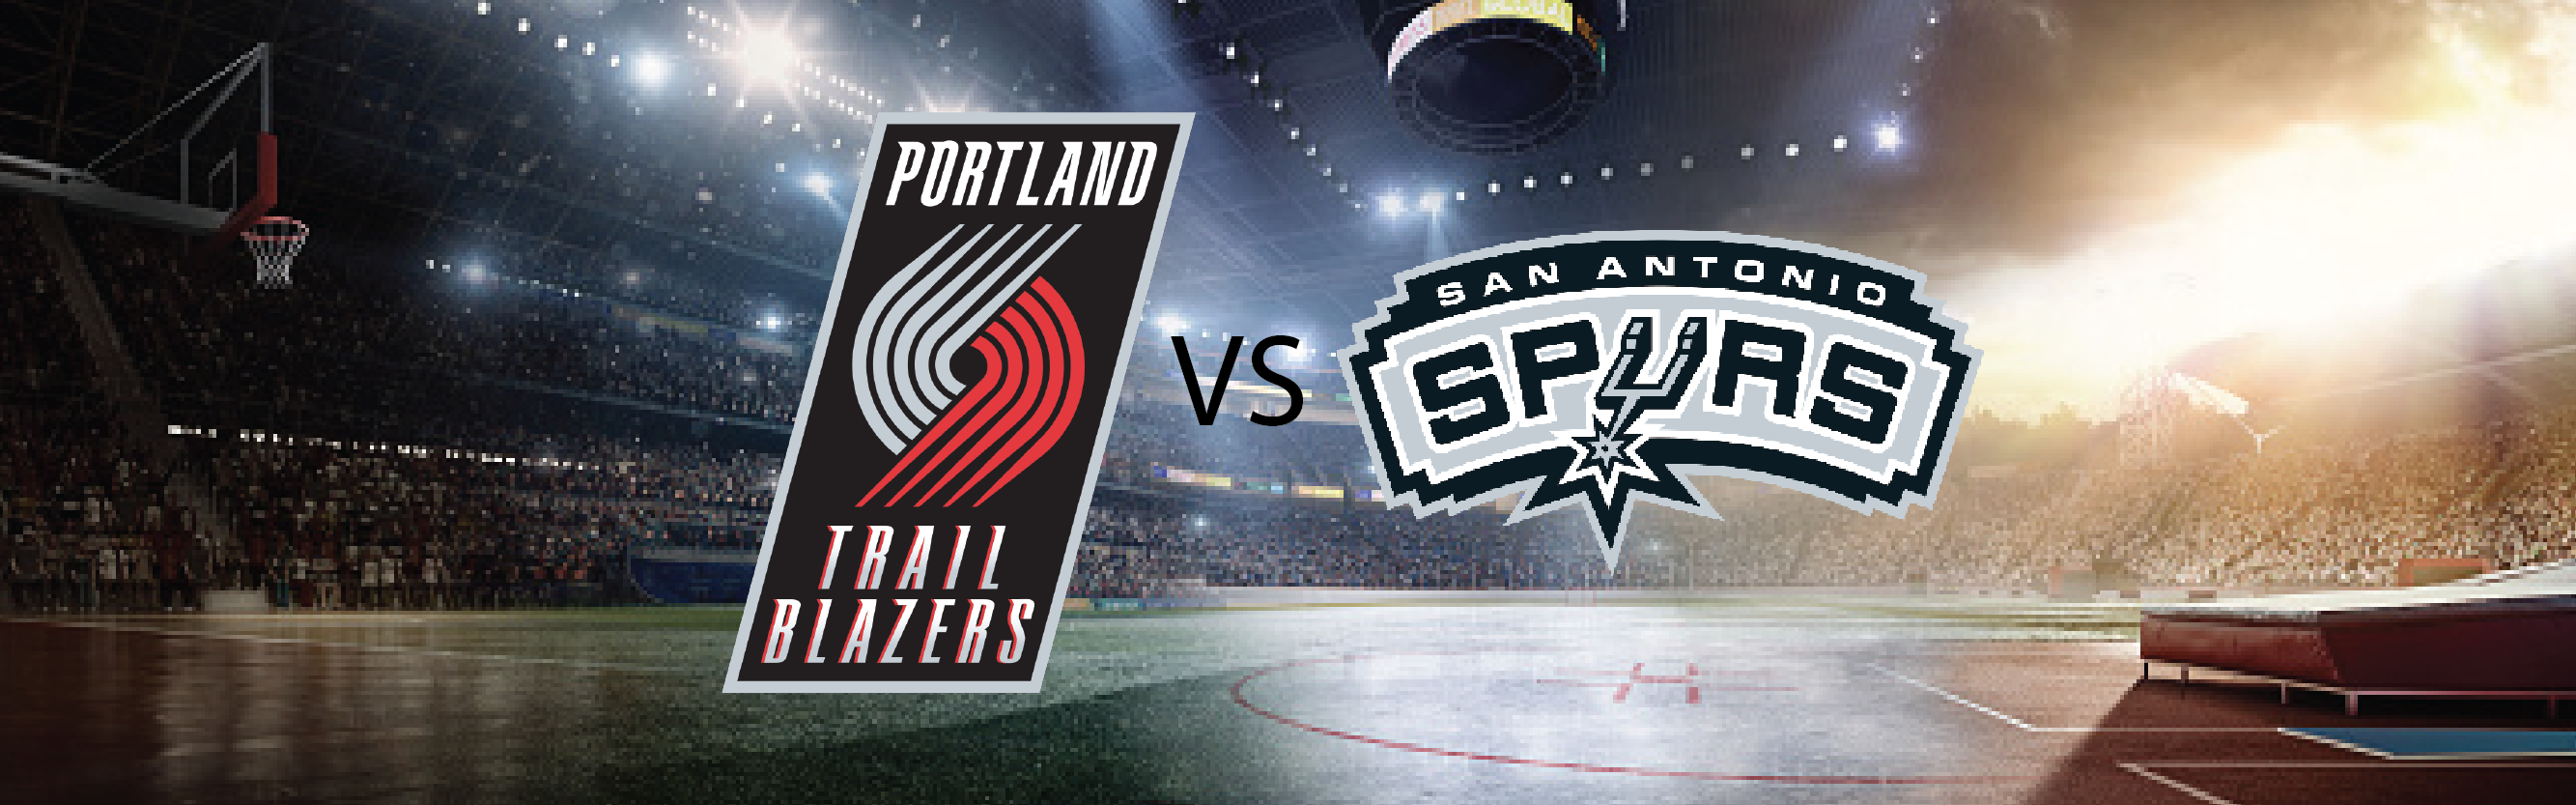 Portland Trail Blazers vs San Antonio Spurs with Hewlett Packard Enterprise – Portland, OR